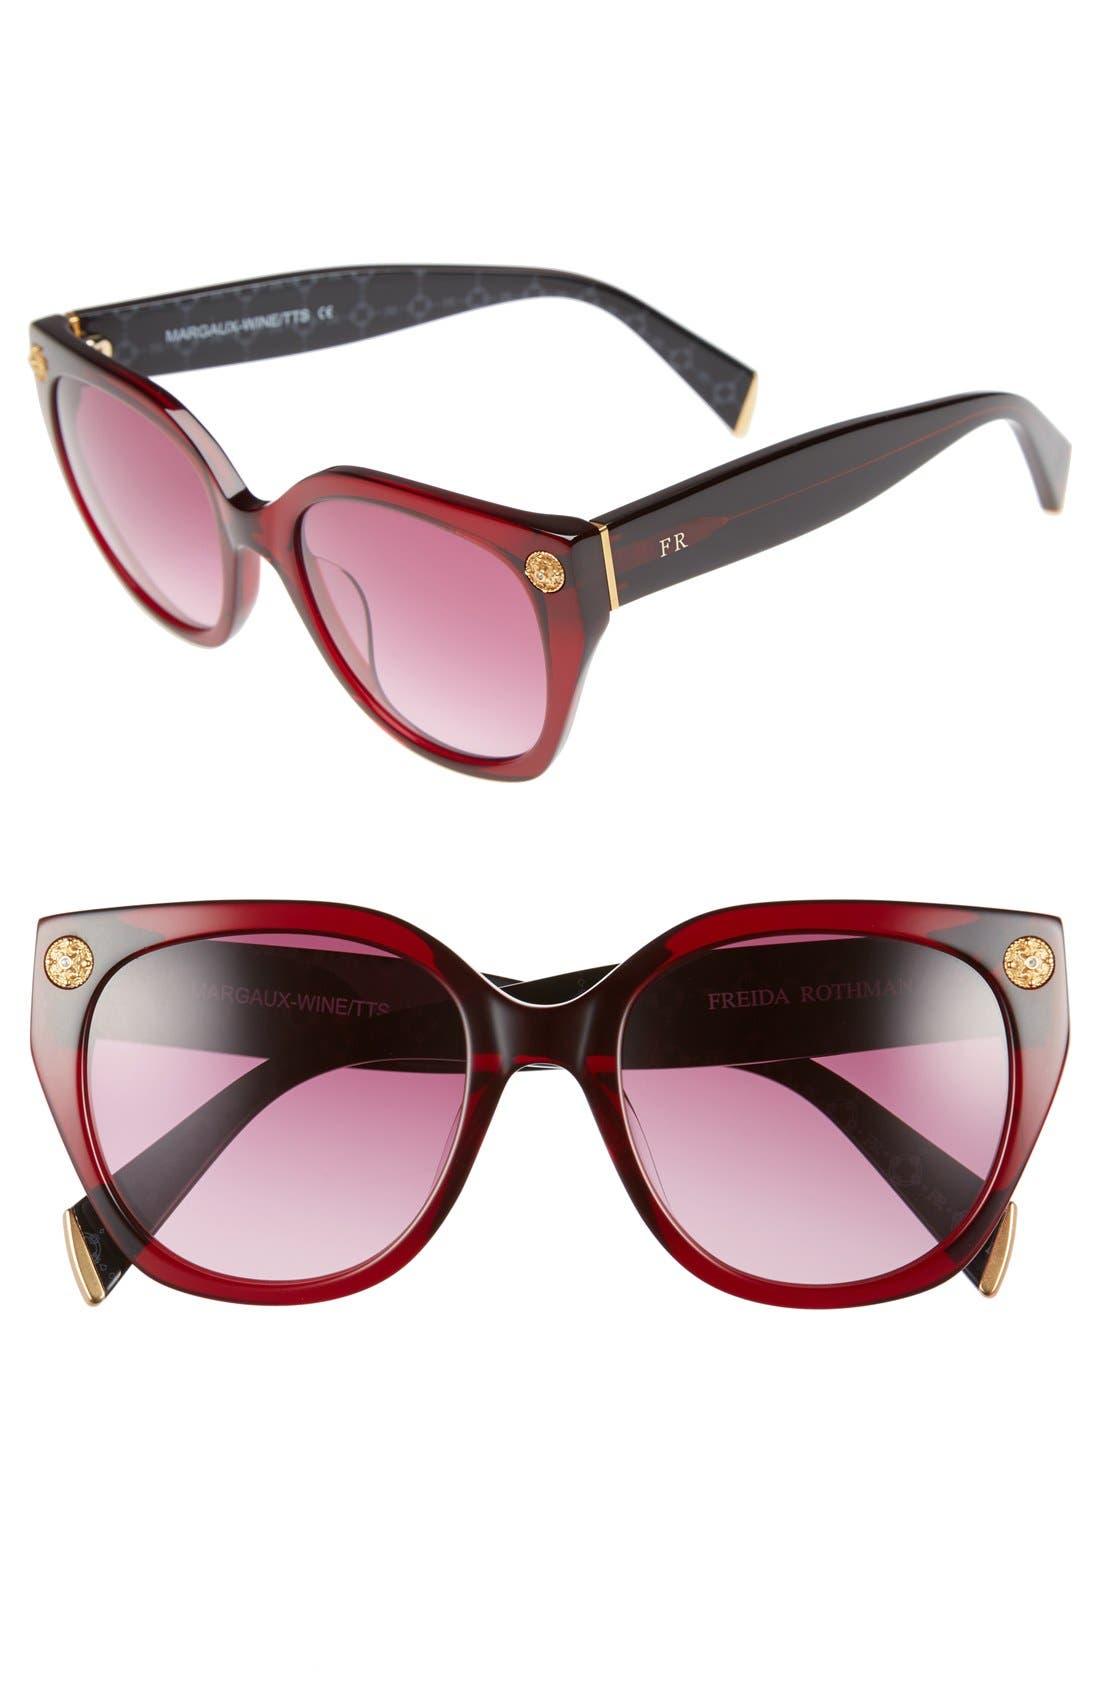 FreidaRothman'MargauxElegant' 54mmRetro Sunglasses,                             Main thumbnail 1, color,                             Wine